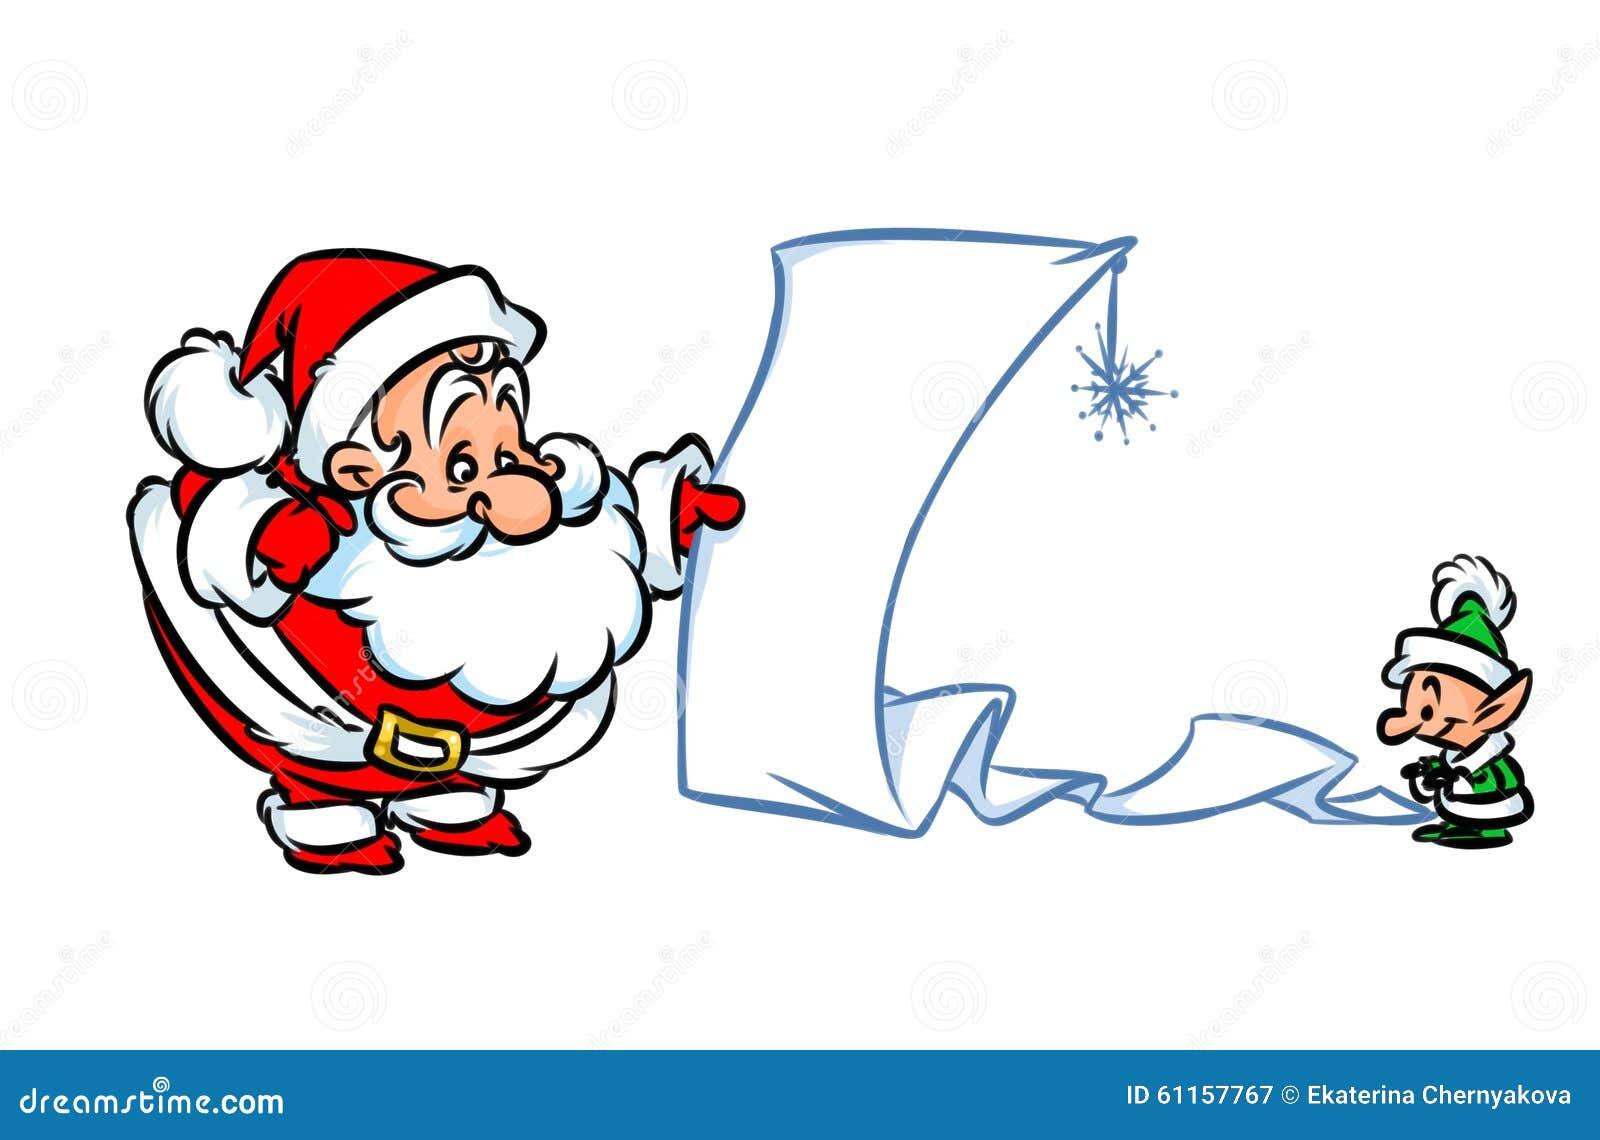 santa claus holiday gift list cartoon illustration royalty free stock photography - Holiday Cartoons Free